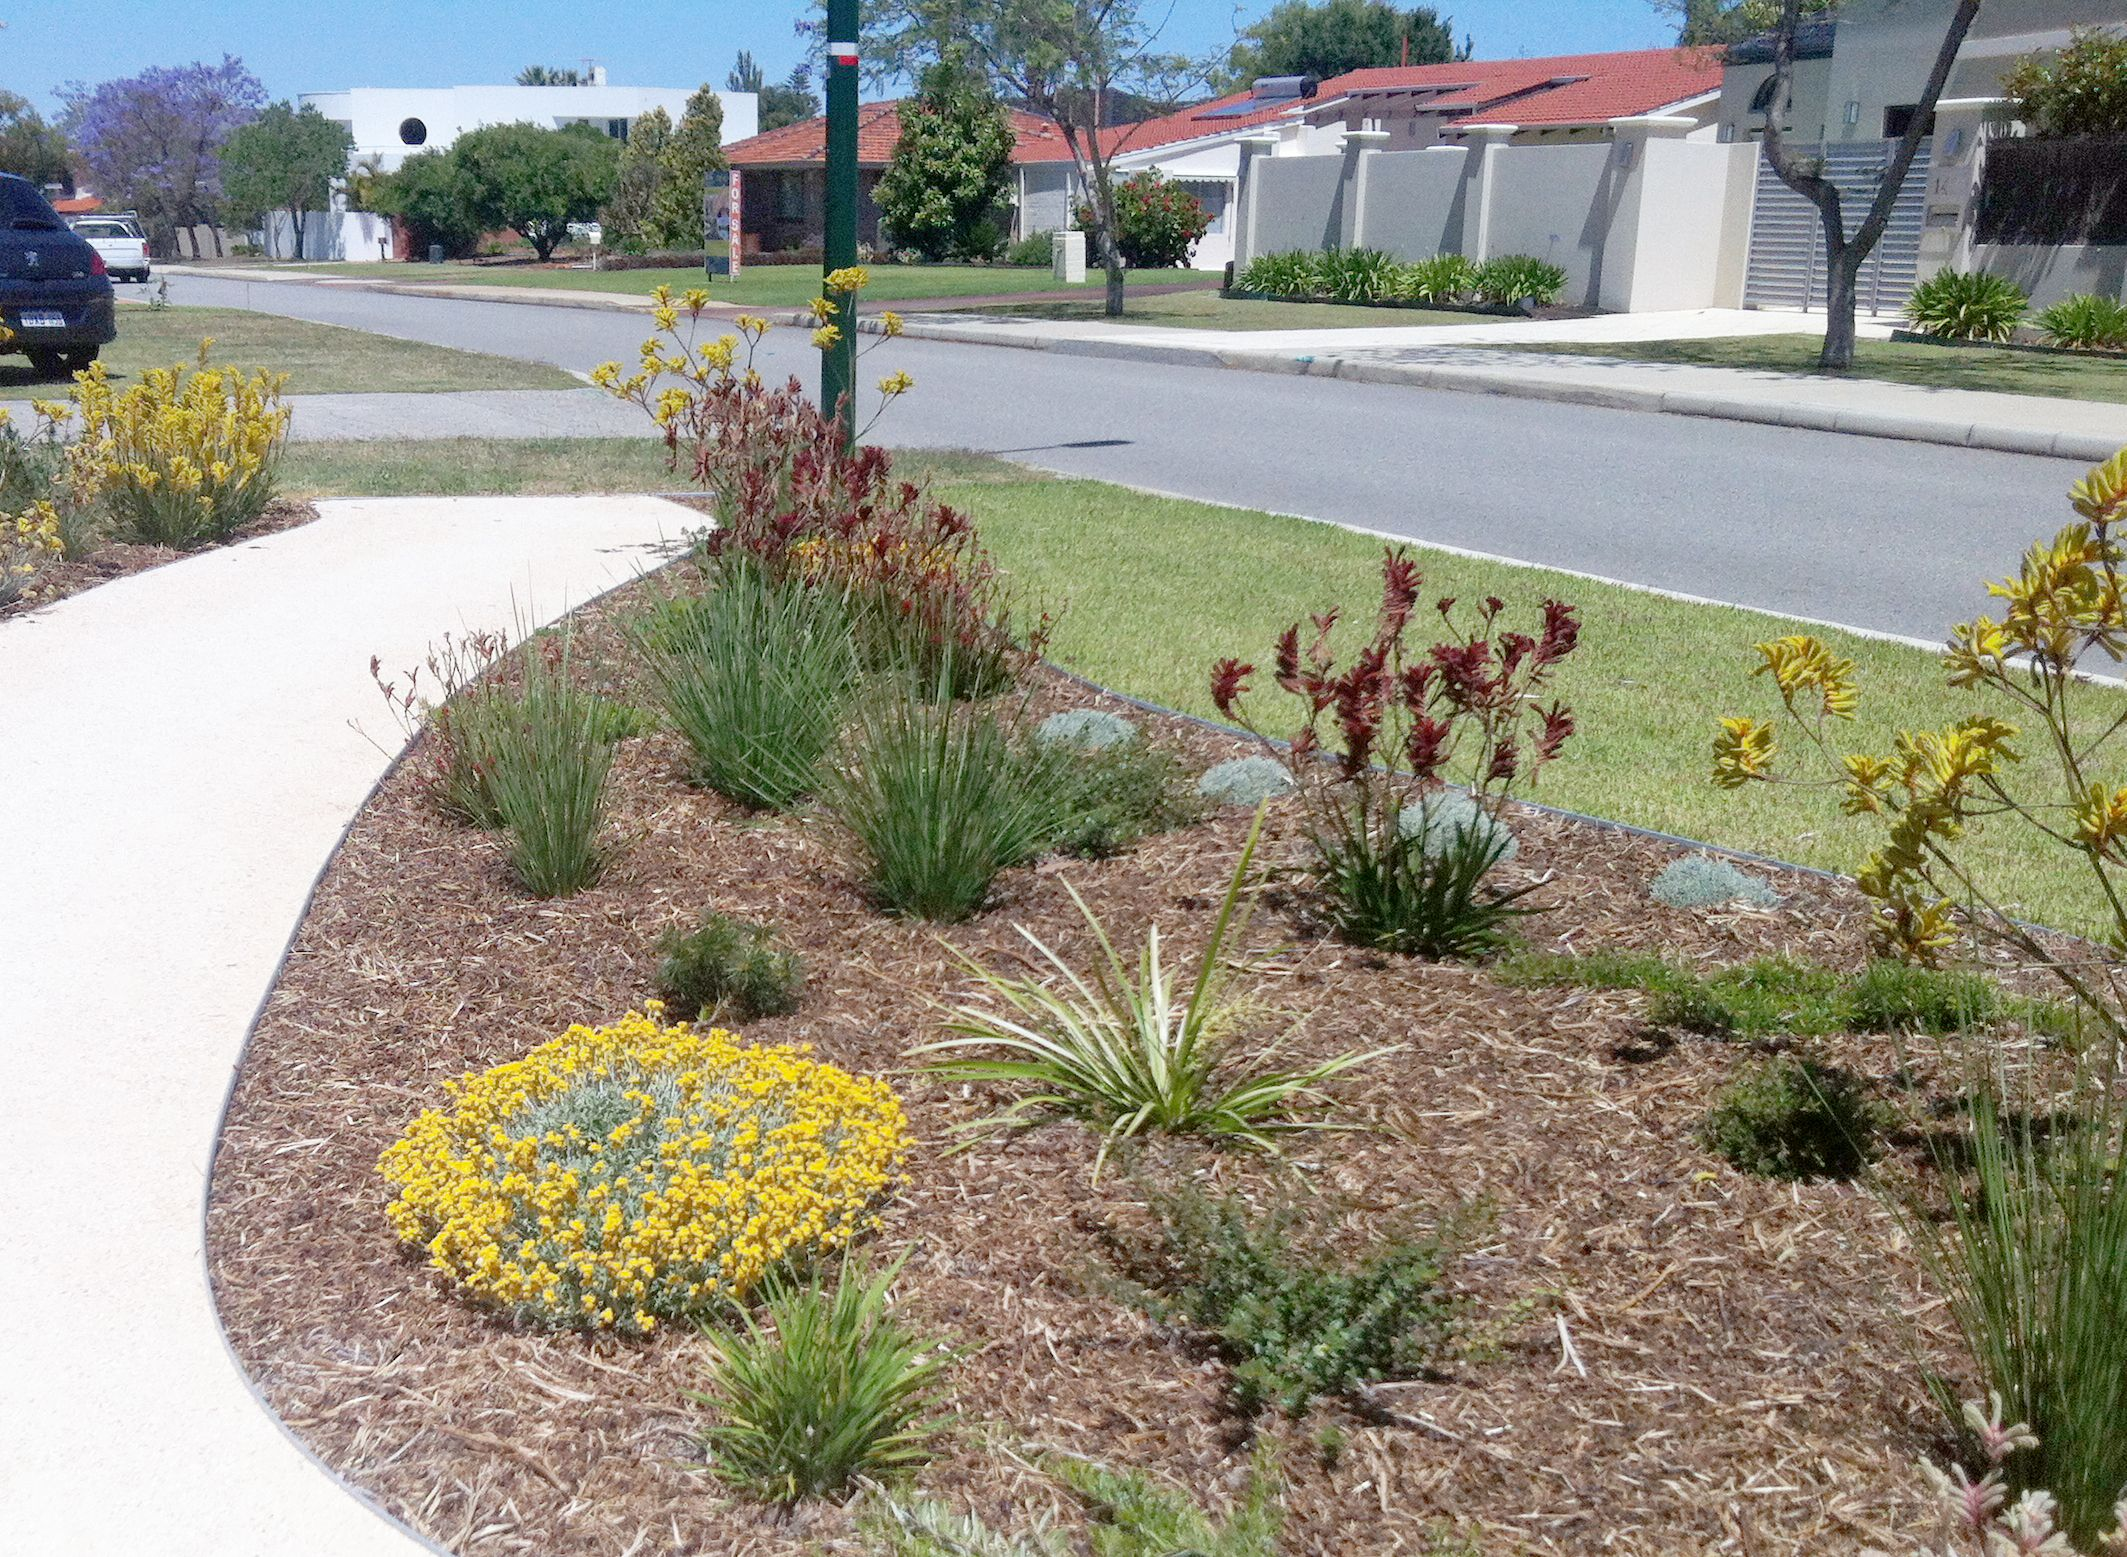 17 best images about garden design on pinterest gardens australian